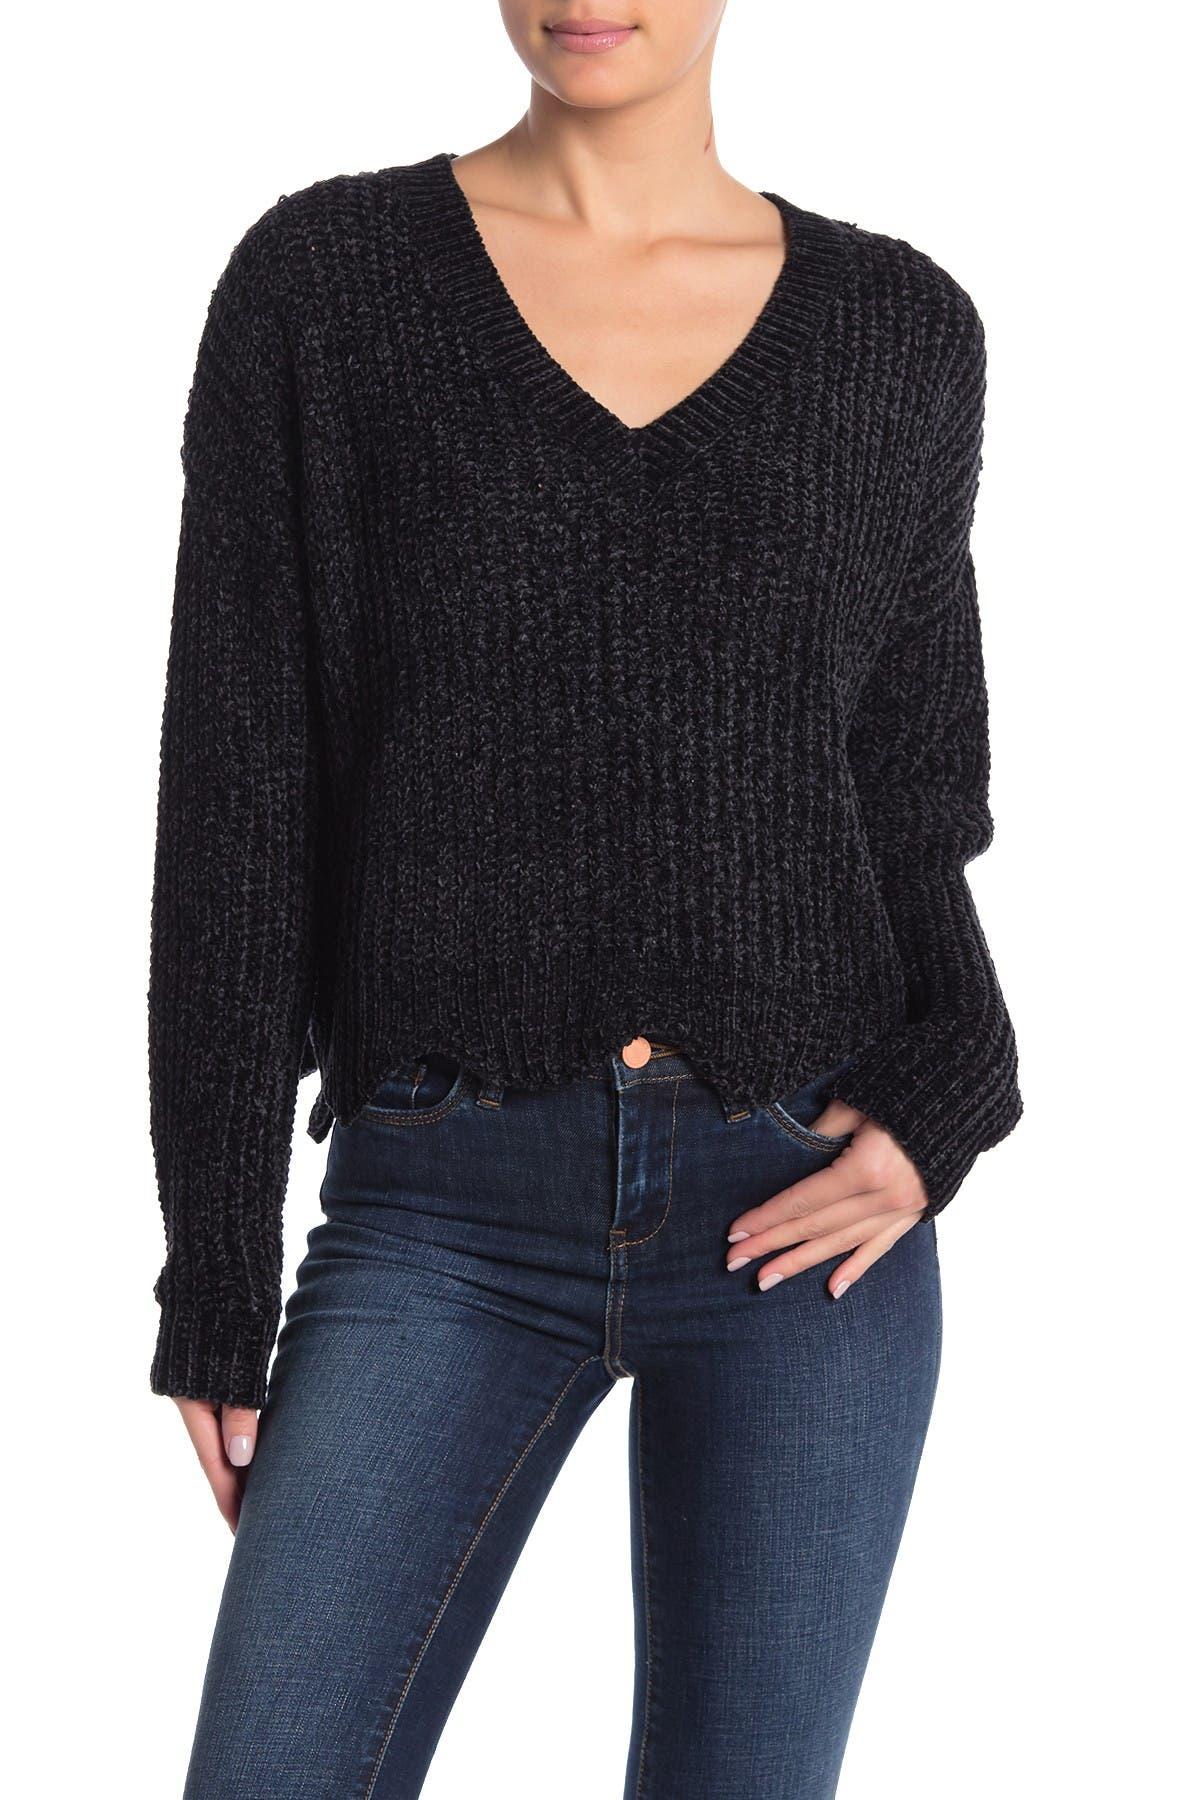 Image of Lush V-Neck Scalloped Chenille Sweater